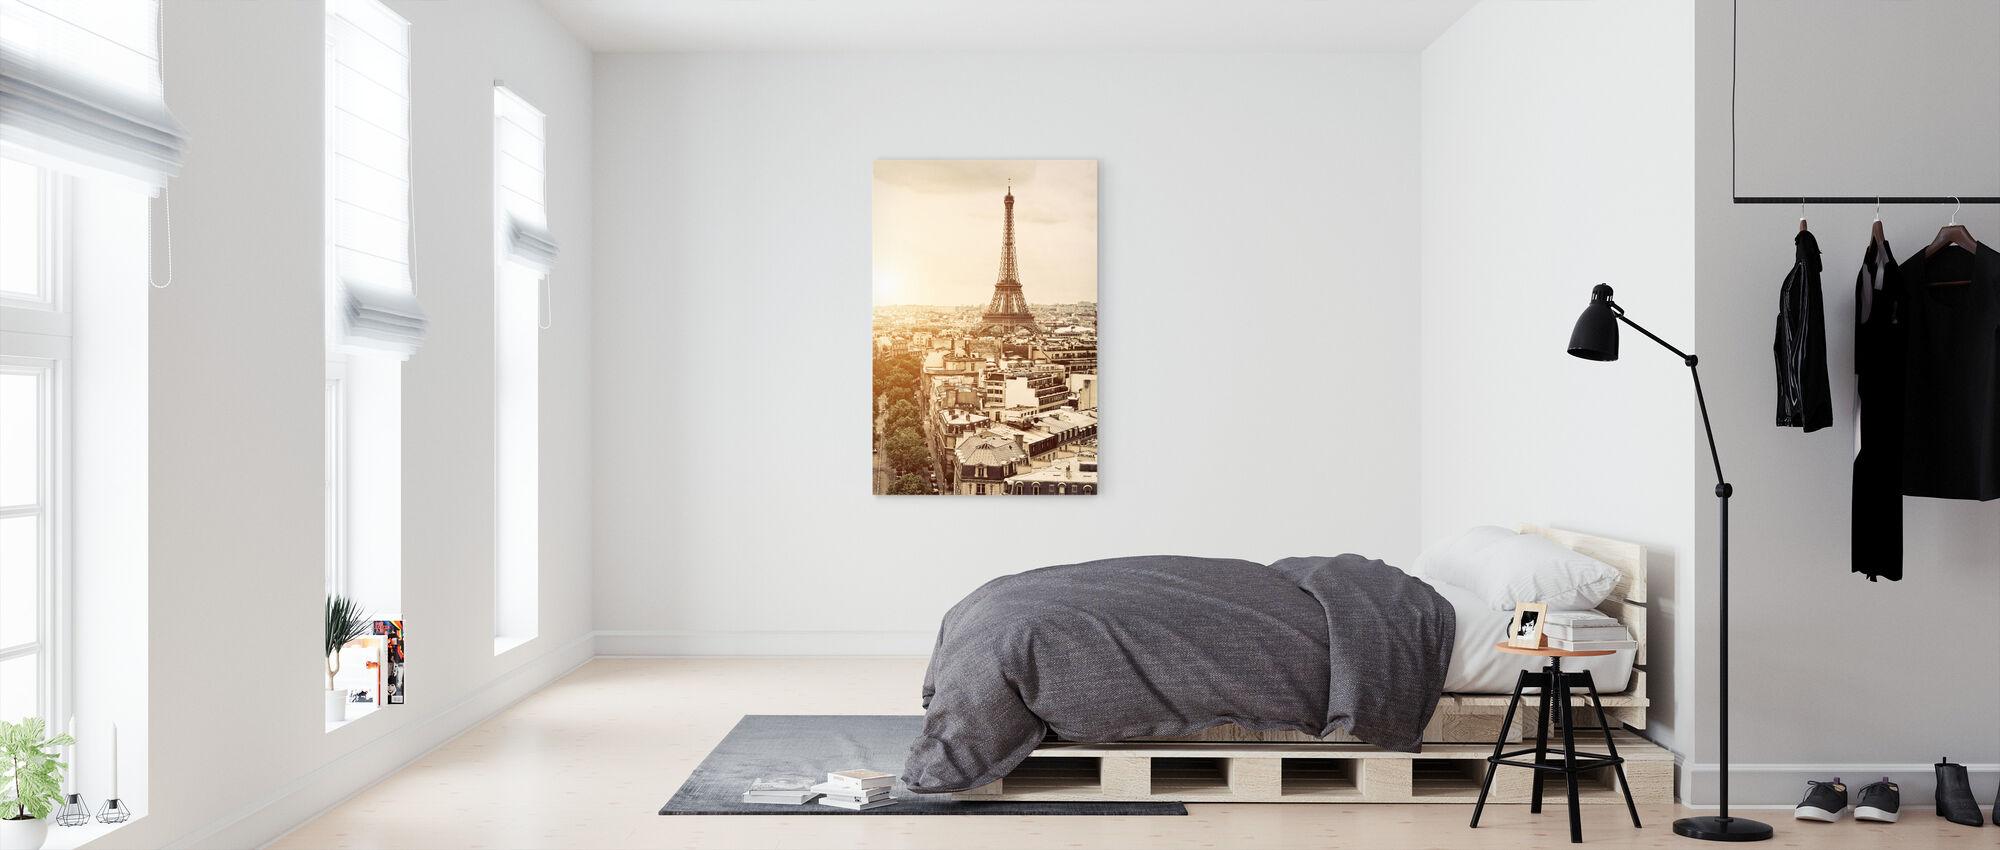 Paris - Eiffel Tower - Canvas print - Bedroom